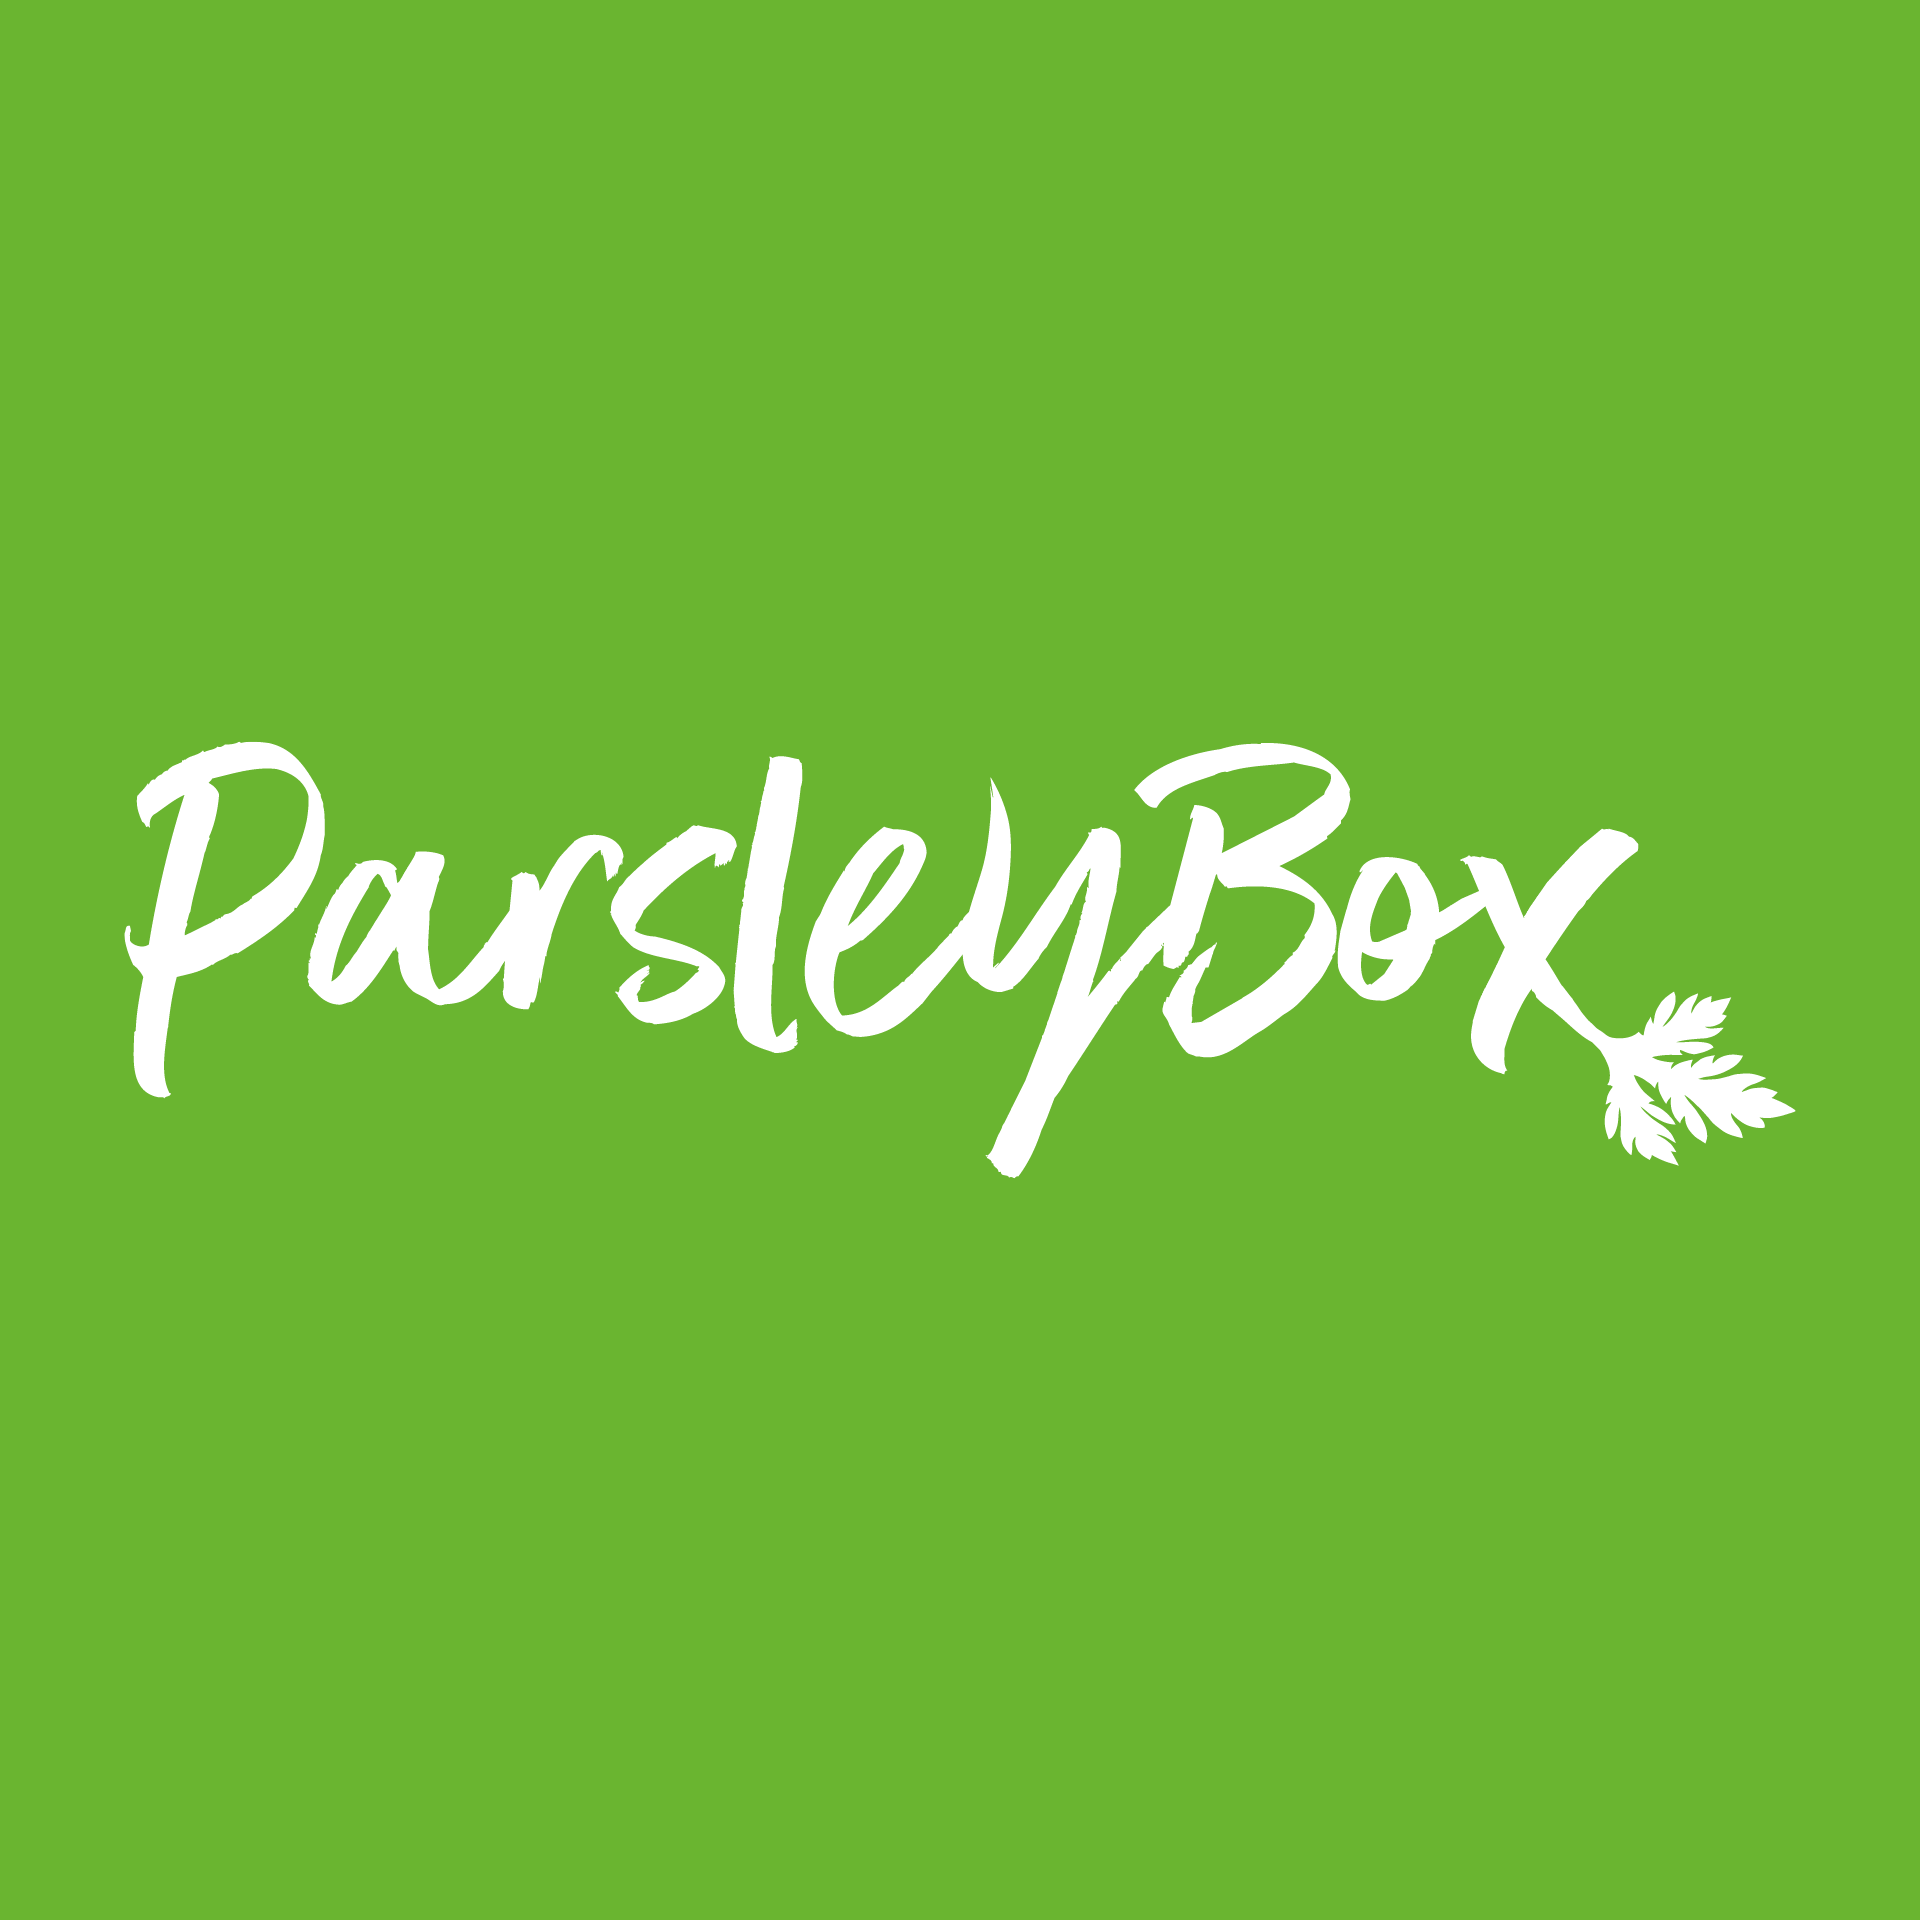 Parsley Box's logo